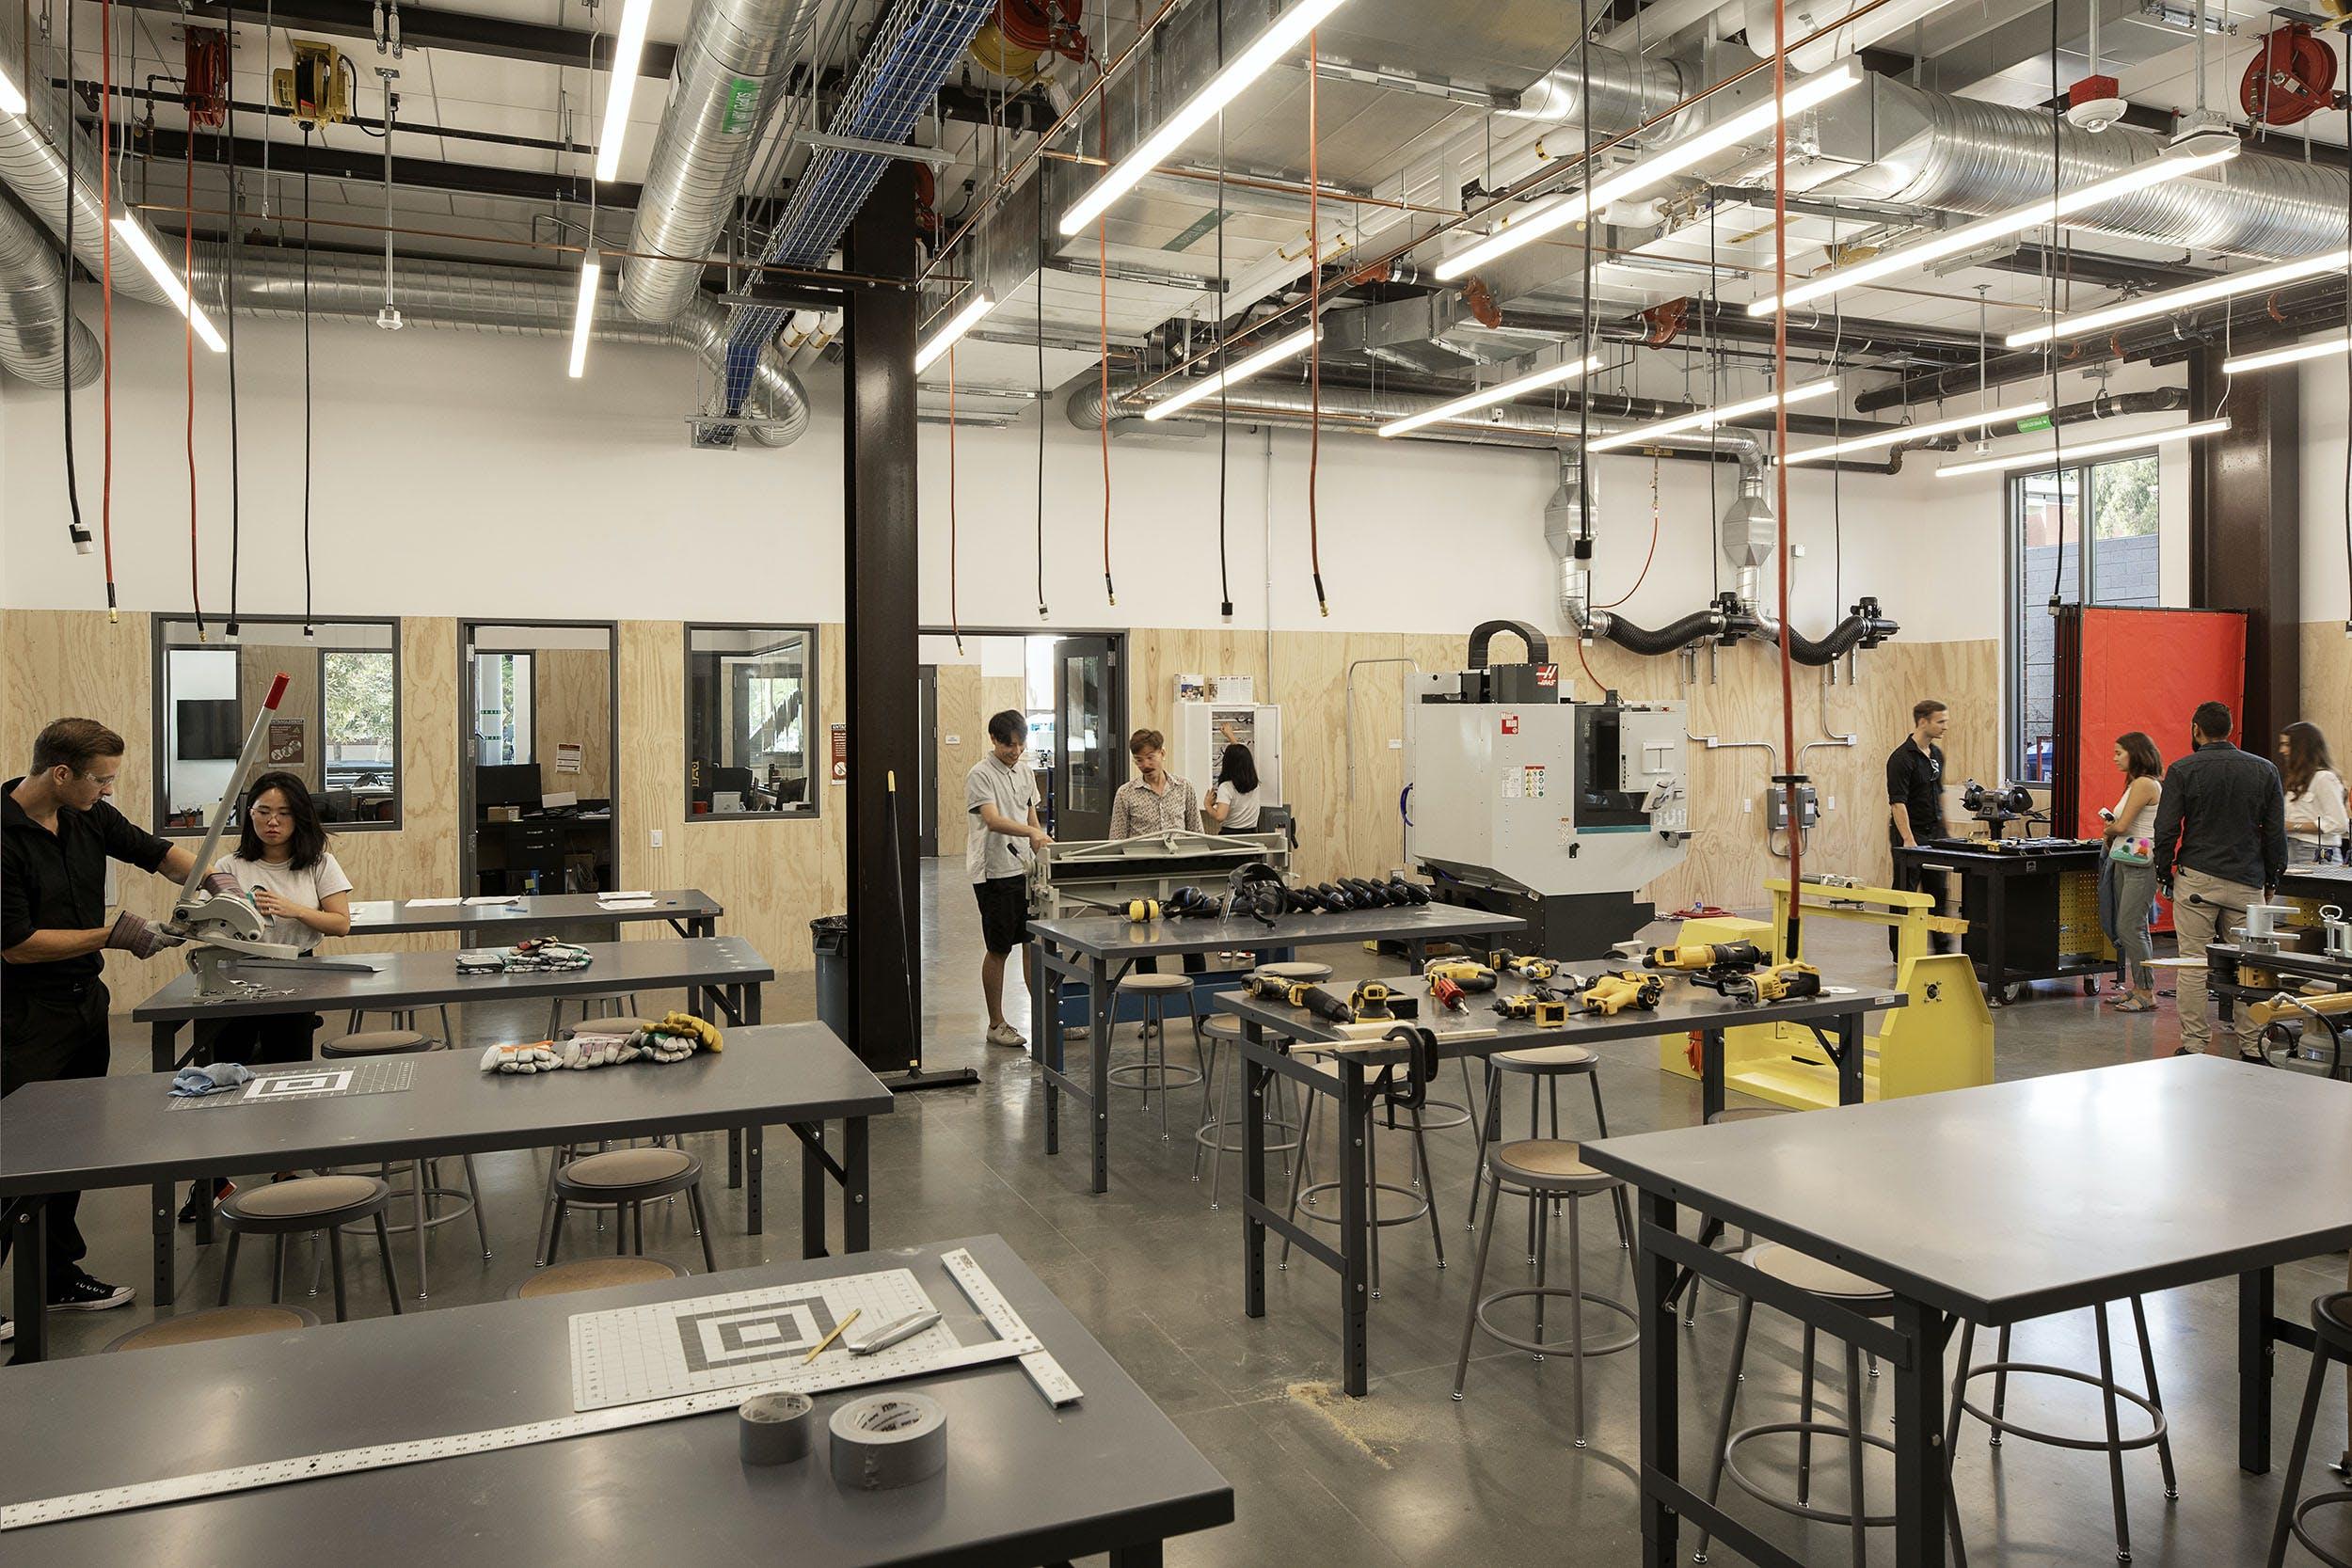 Students working in industrial workshop, makerspace